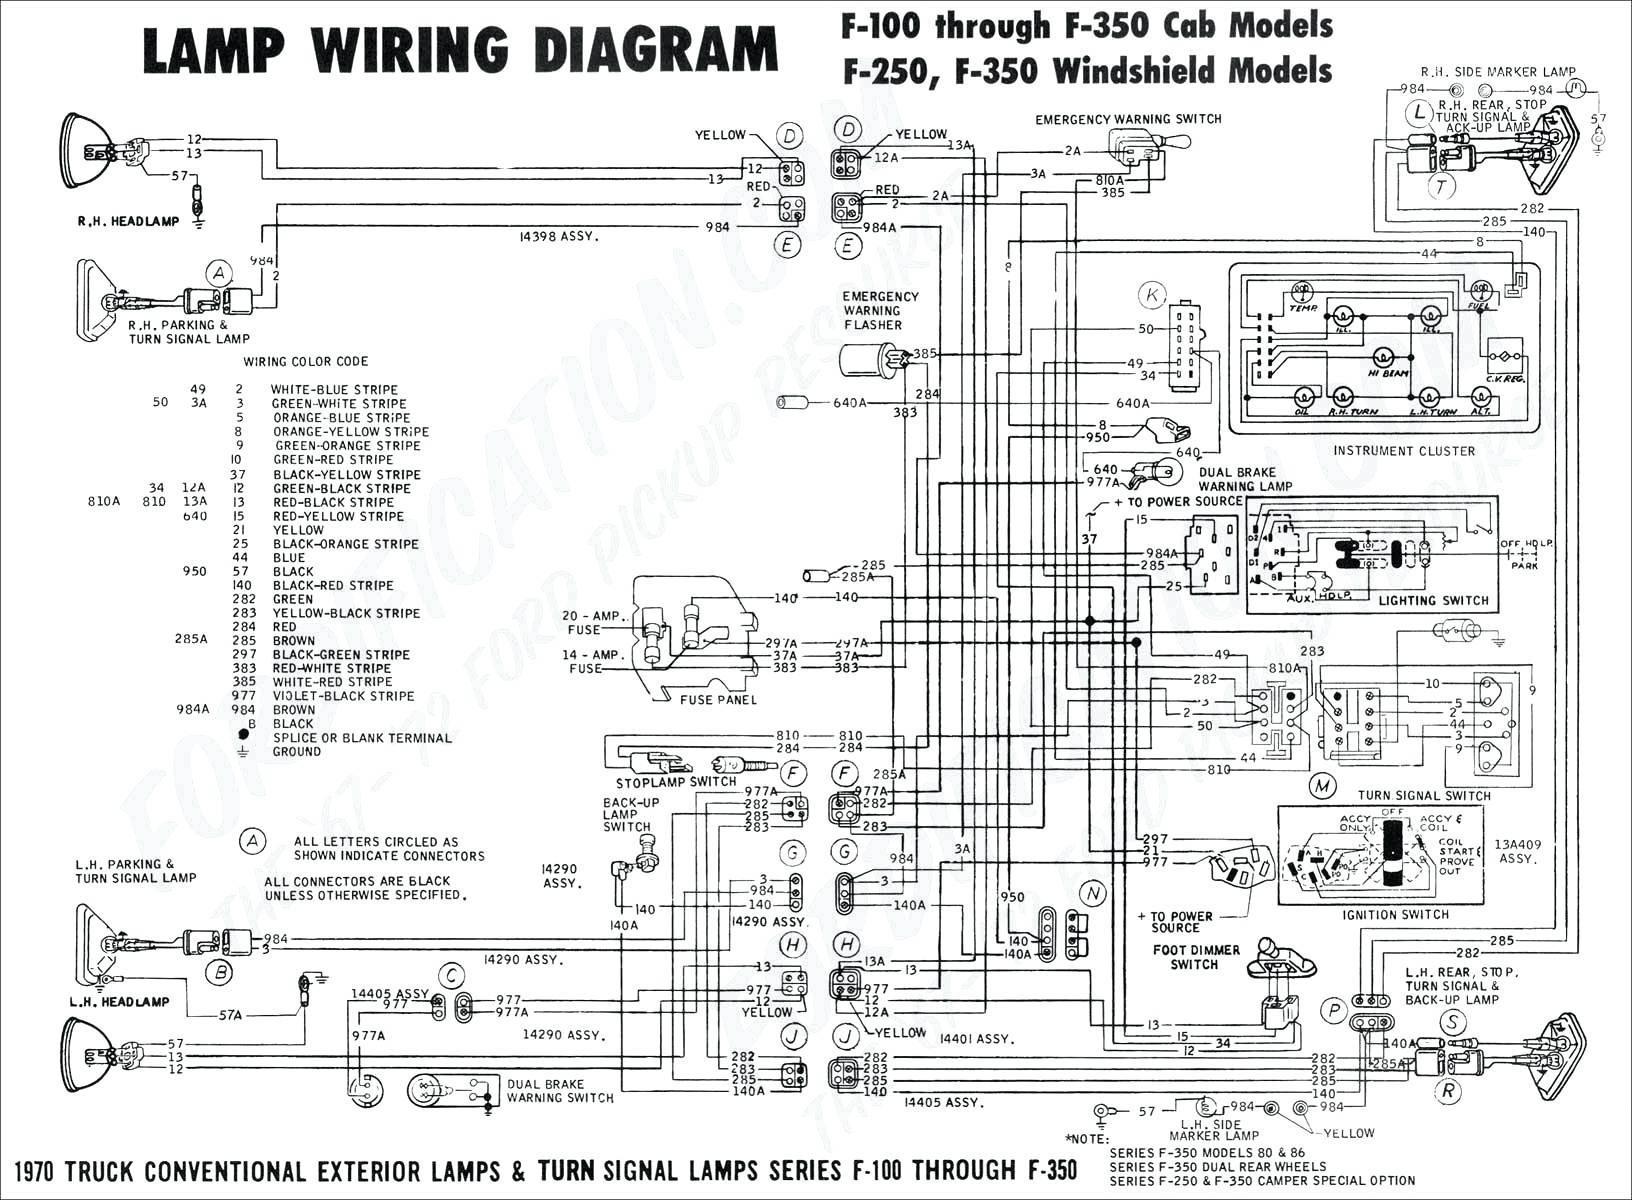 Simple Turn Signal Wiring Diagram Wiring Diagram Ididit Steering Column Simple Wiring Diagram Datasource Of Simple Turn Signal Wiring Diagram Simple Turn Signal Wiring Diagram Wiring Diagram today